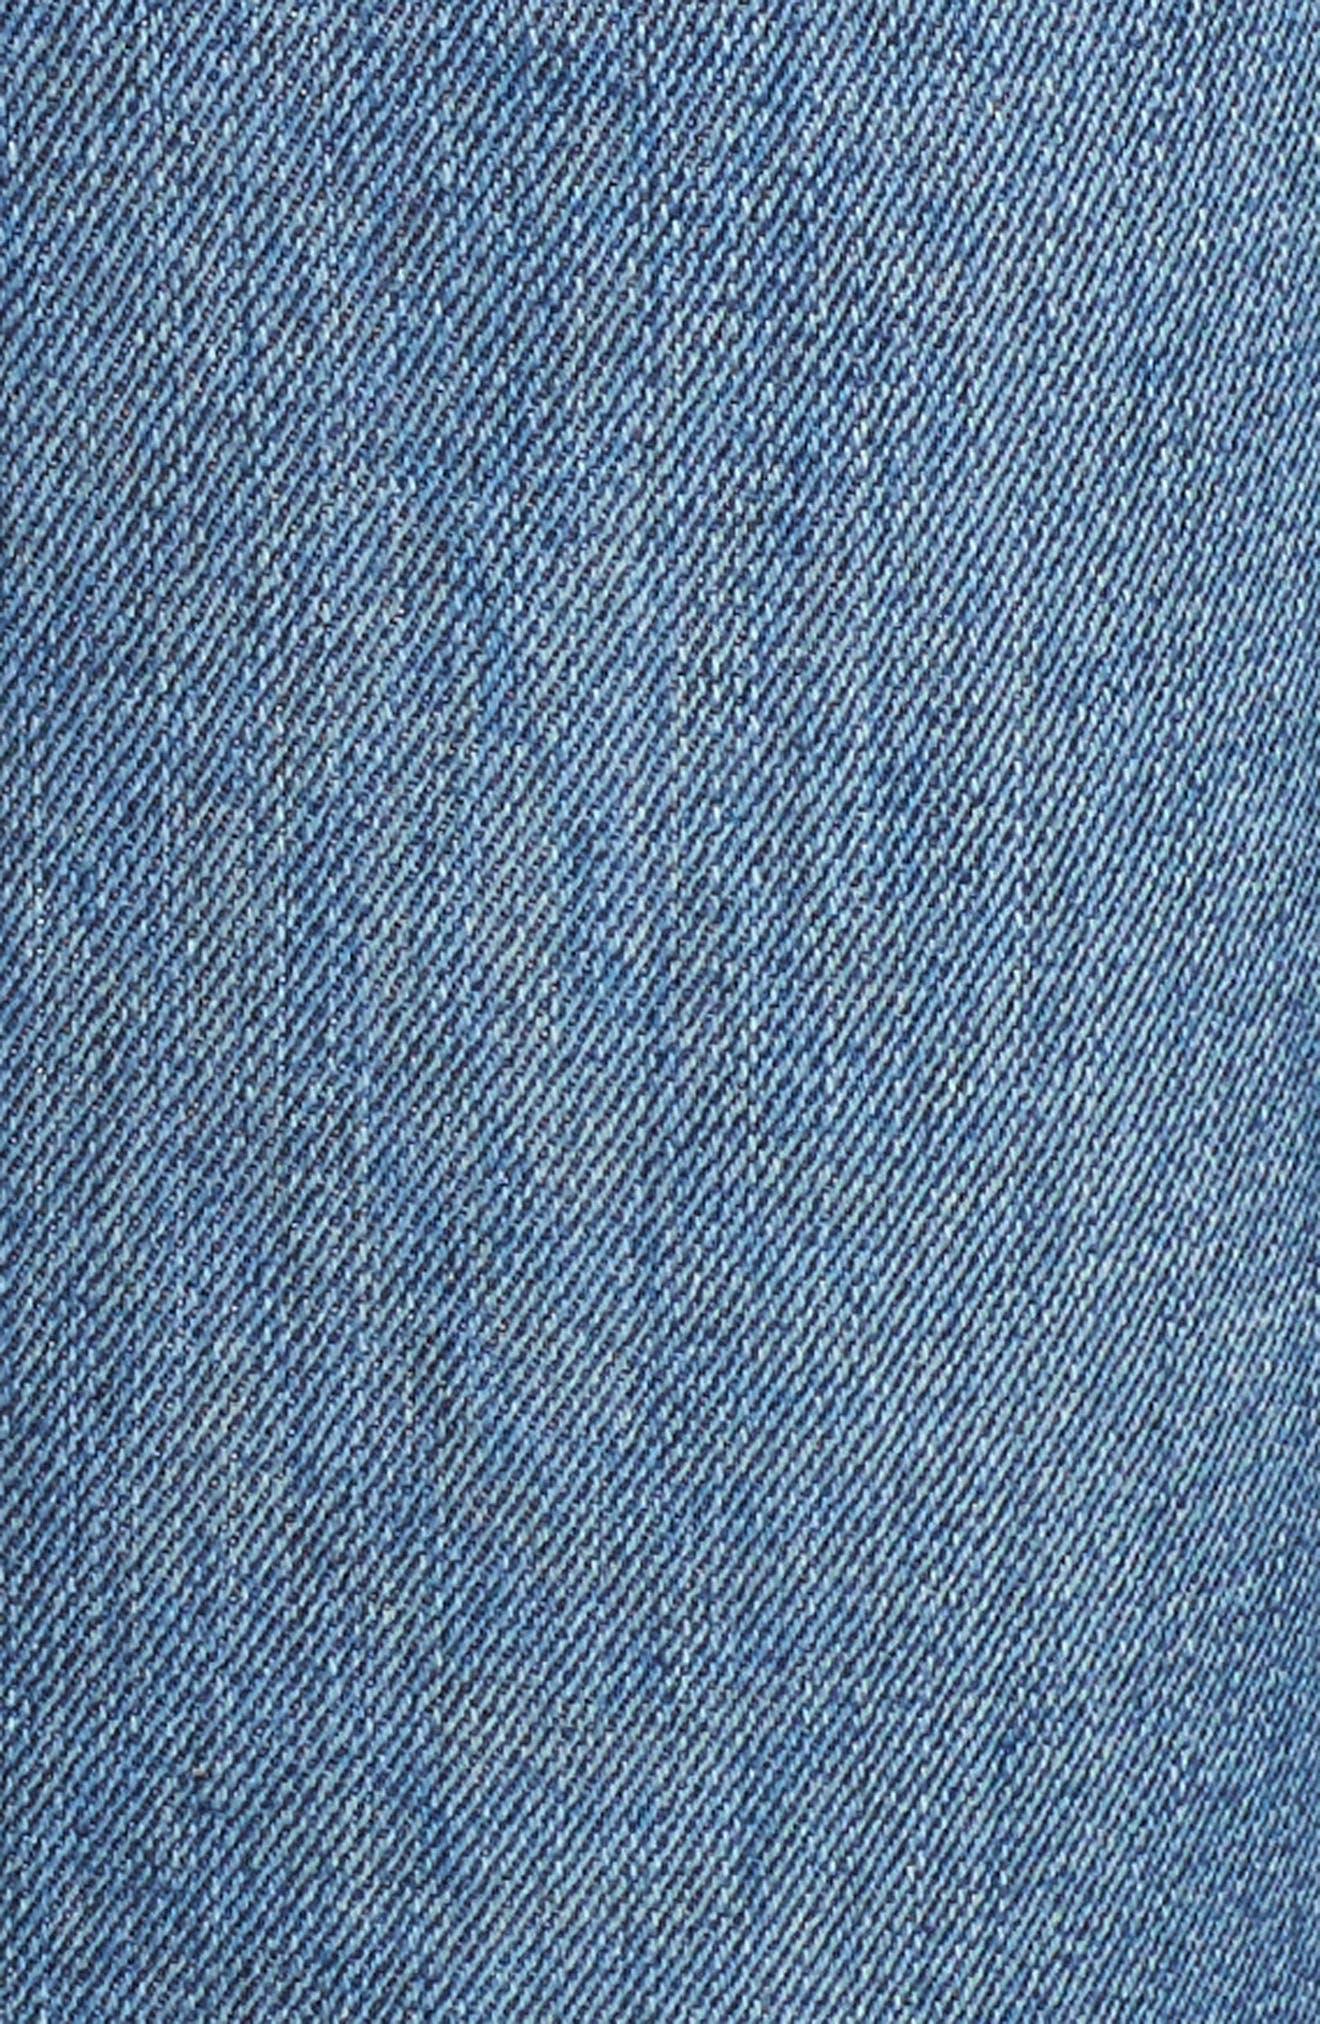 Bombshell Raw Hem Stretch Skinny Jeans,                             Alternate thumbnail 6, color,                             Dawn